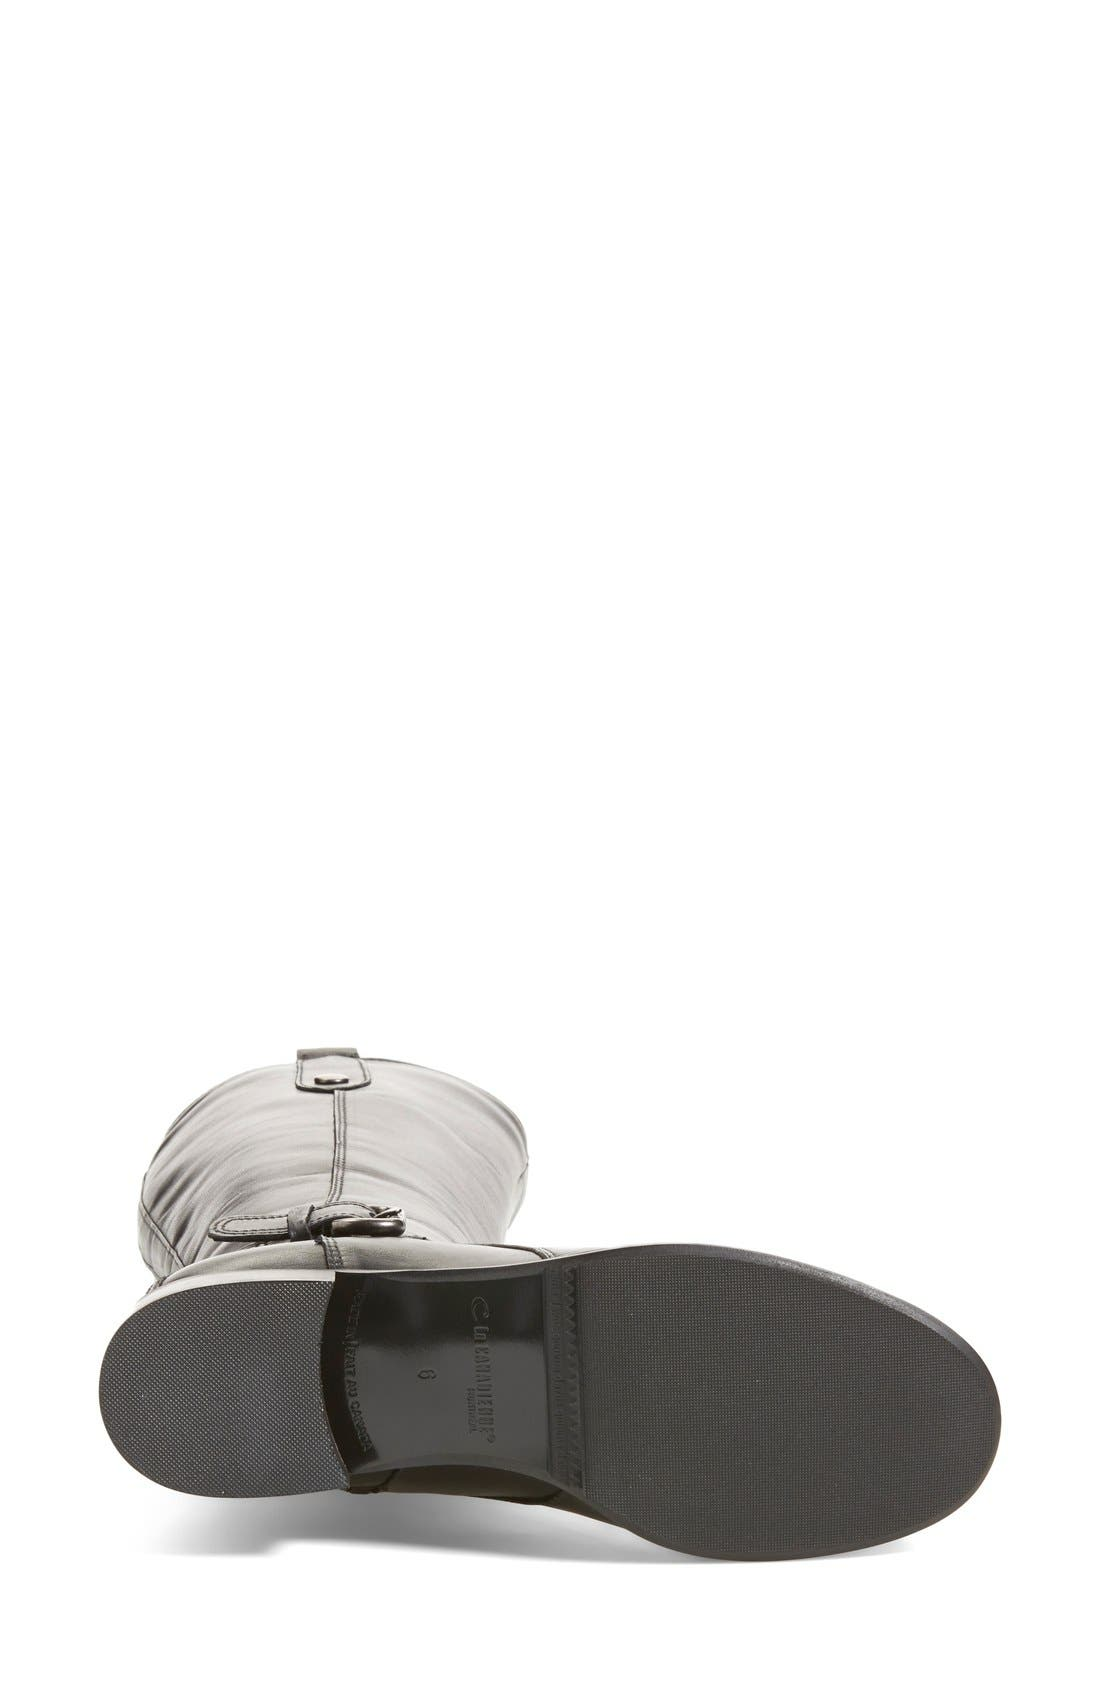 'Stefanie' Waterproof Boot,                             Alternate thumbnail 10, color,                             BLACK LEATHER